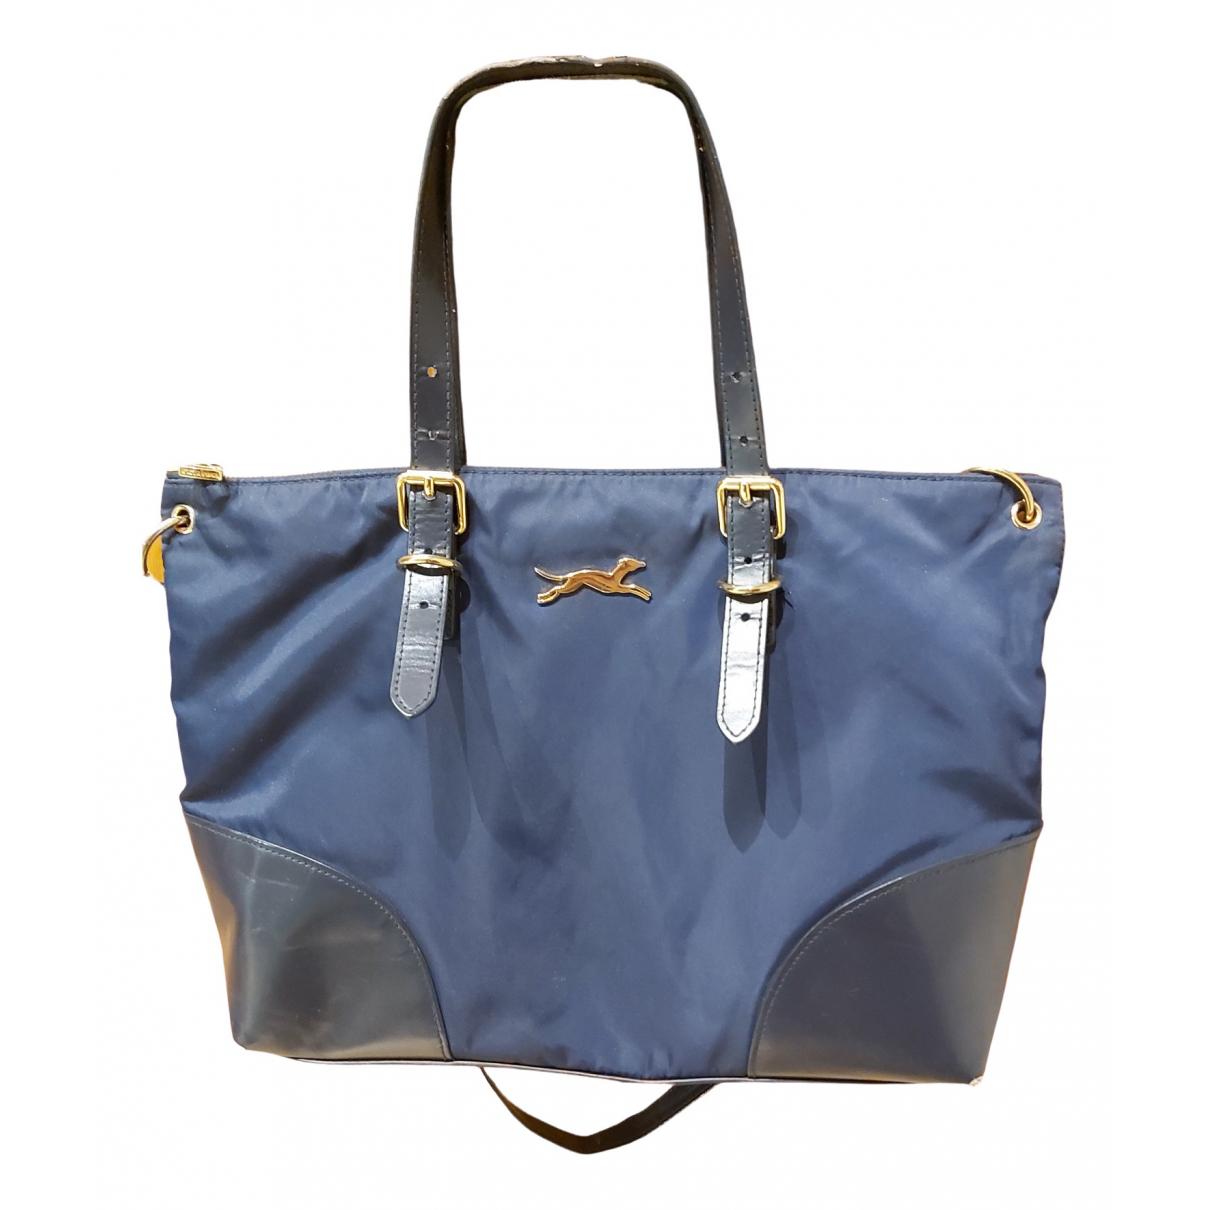 Bimba Y Lola \N Handtasche in  Marine Leinen